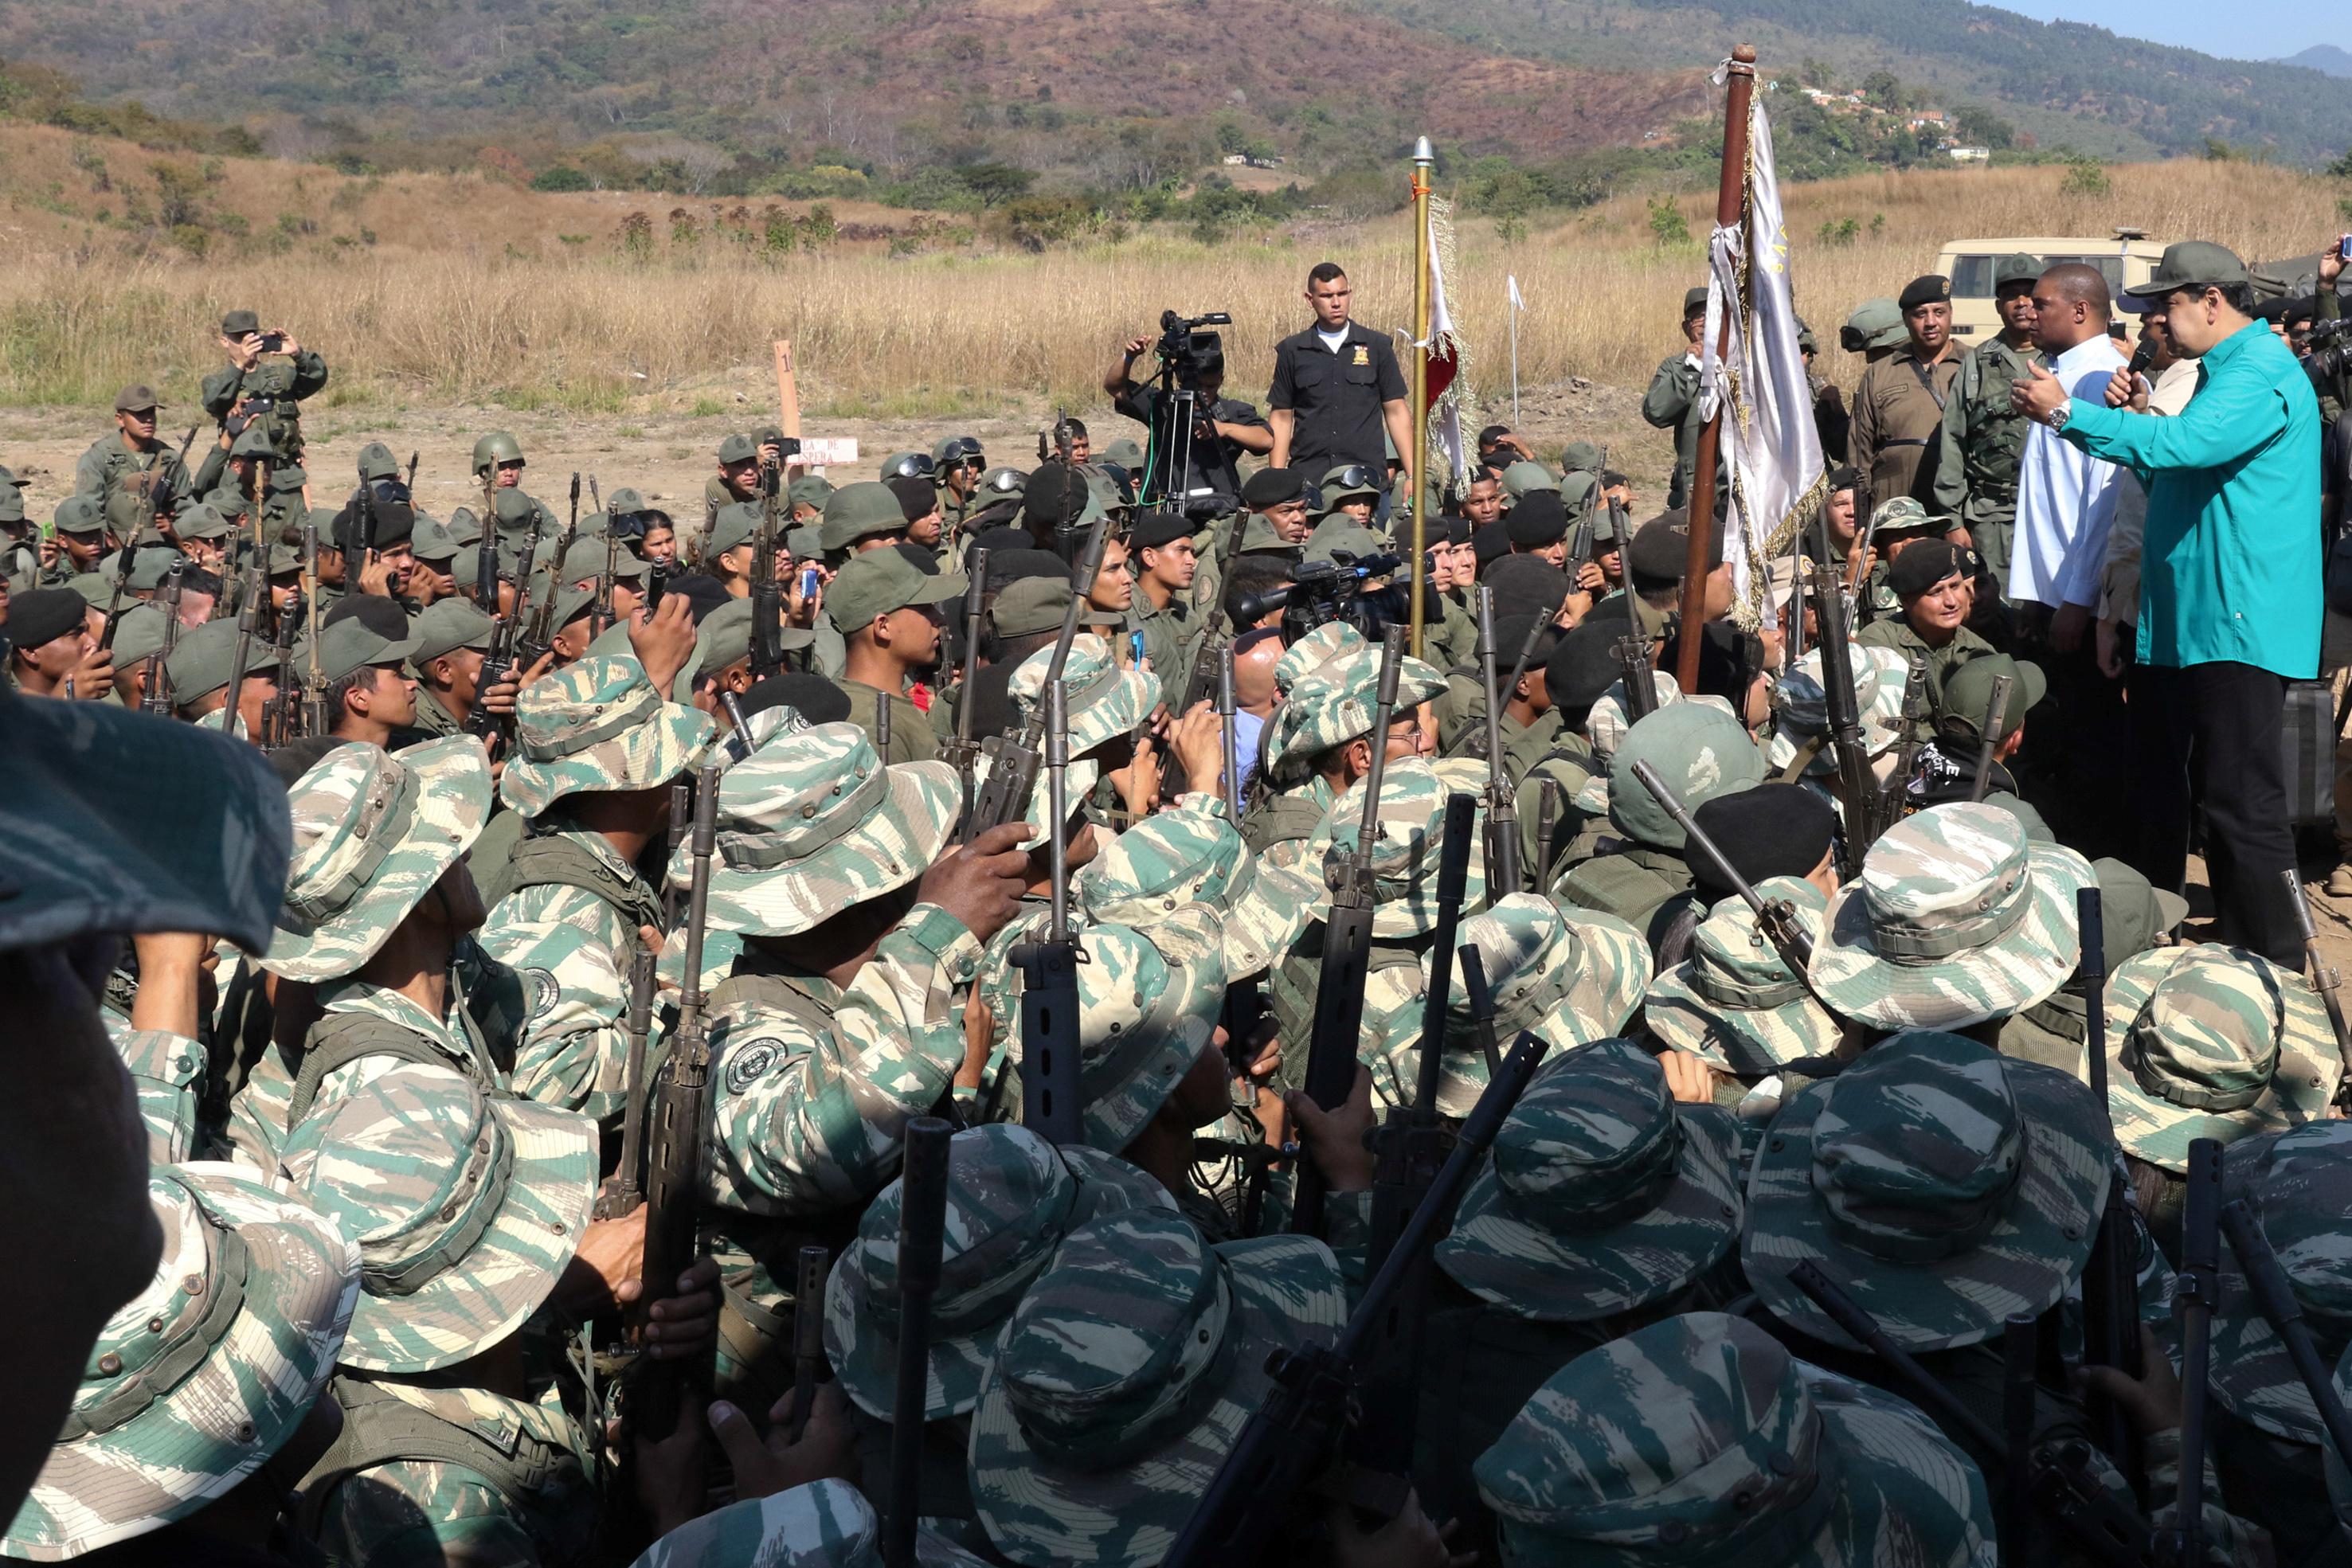 Venezuela's President Nicolas Maduro speaks to soldiers during a military exercise in Valencia, Venezuela January 27, 2019. Miraflores Palace/Handout via REUTERS